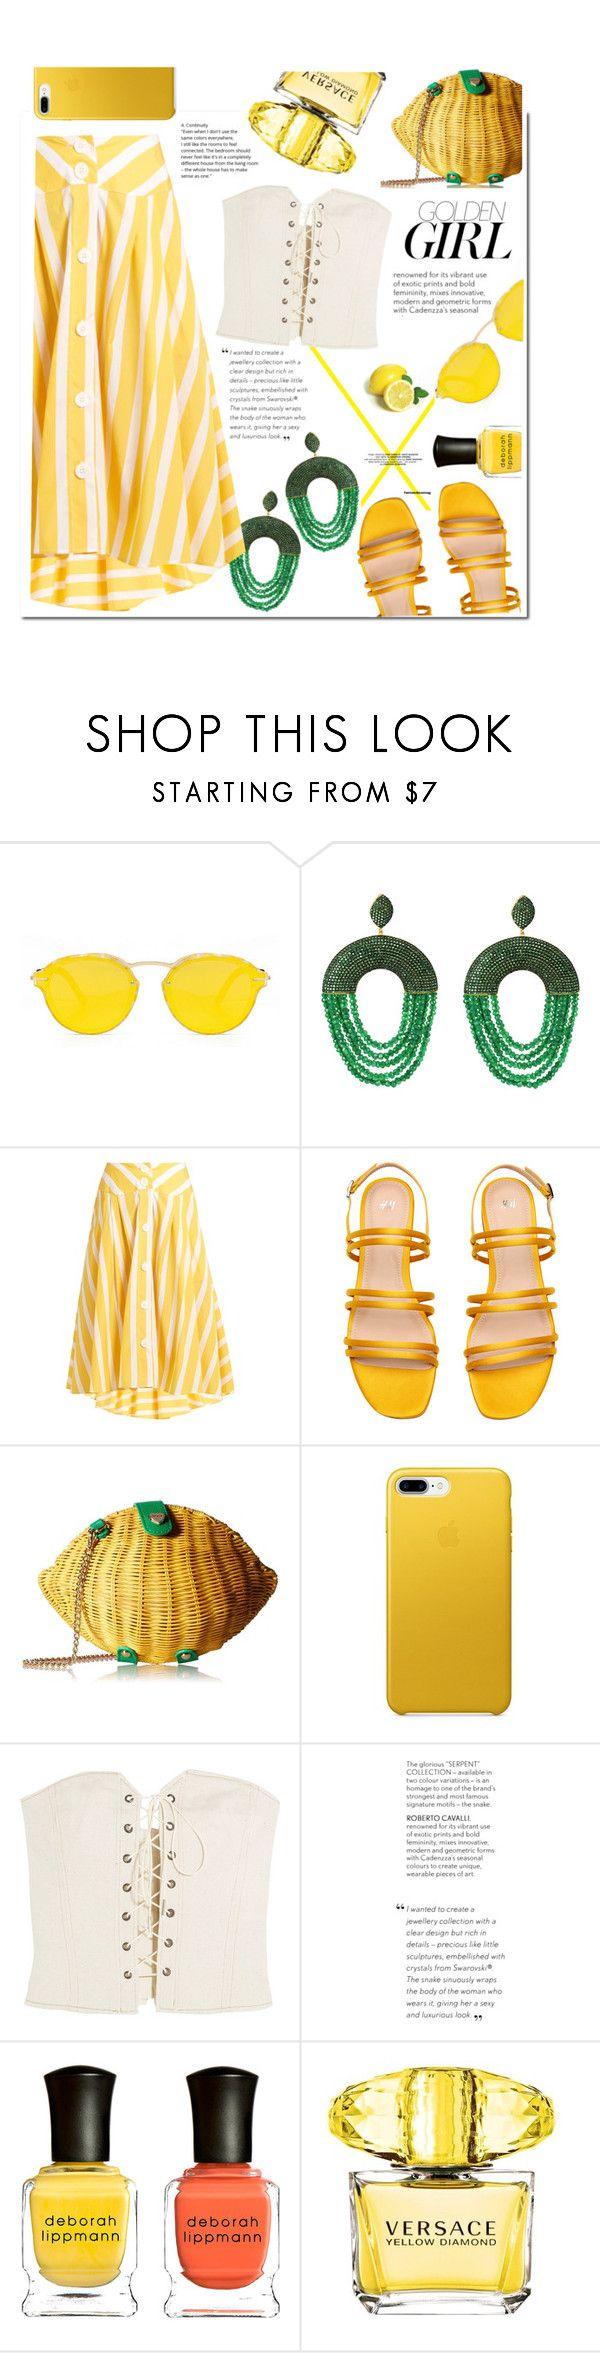 """Lemonade"" by swweetalexutza ❤ liked on Polyvore featuring Thierry Colson, Betsey Johnson, Isabel Marant, Murphy, Deborah Lippmann and Versace"